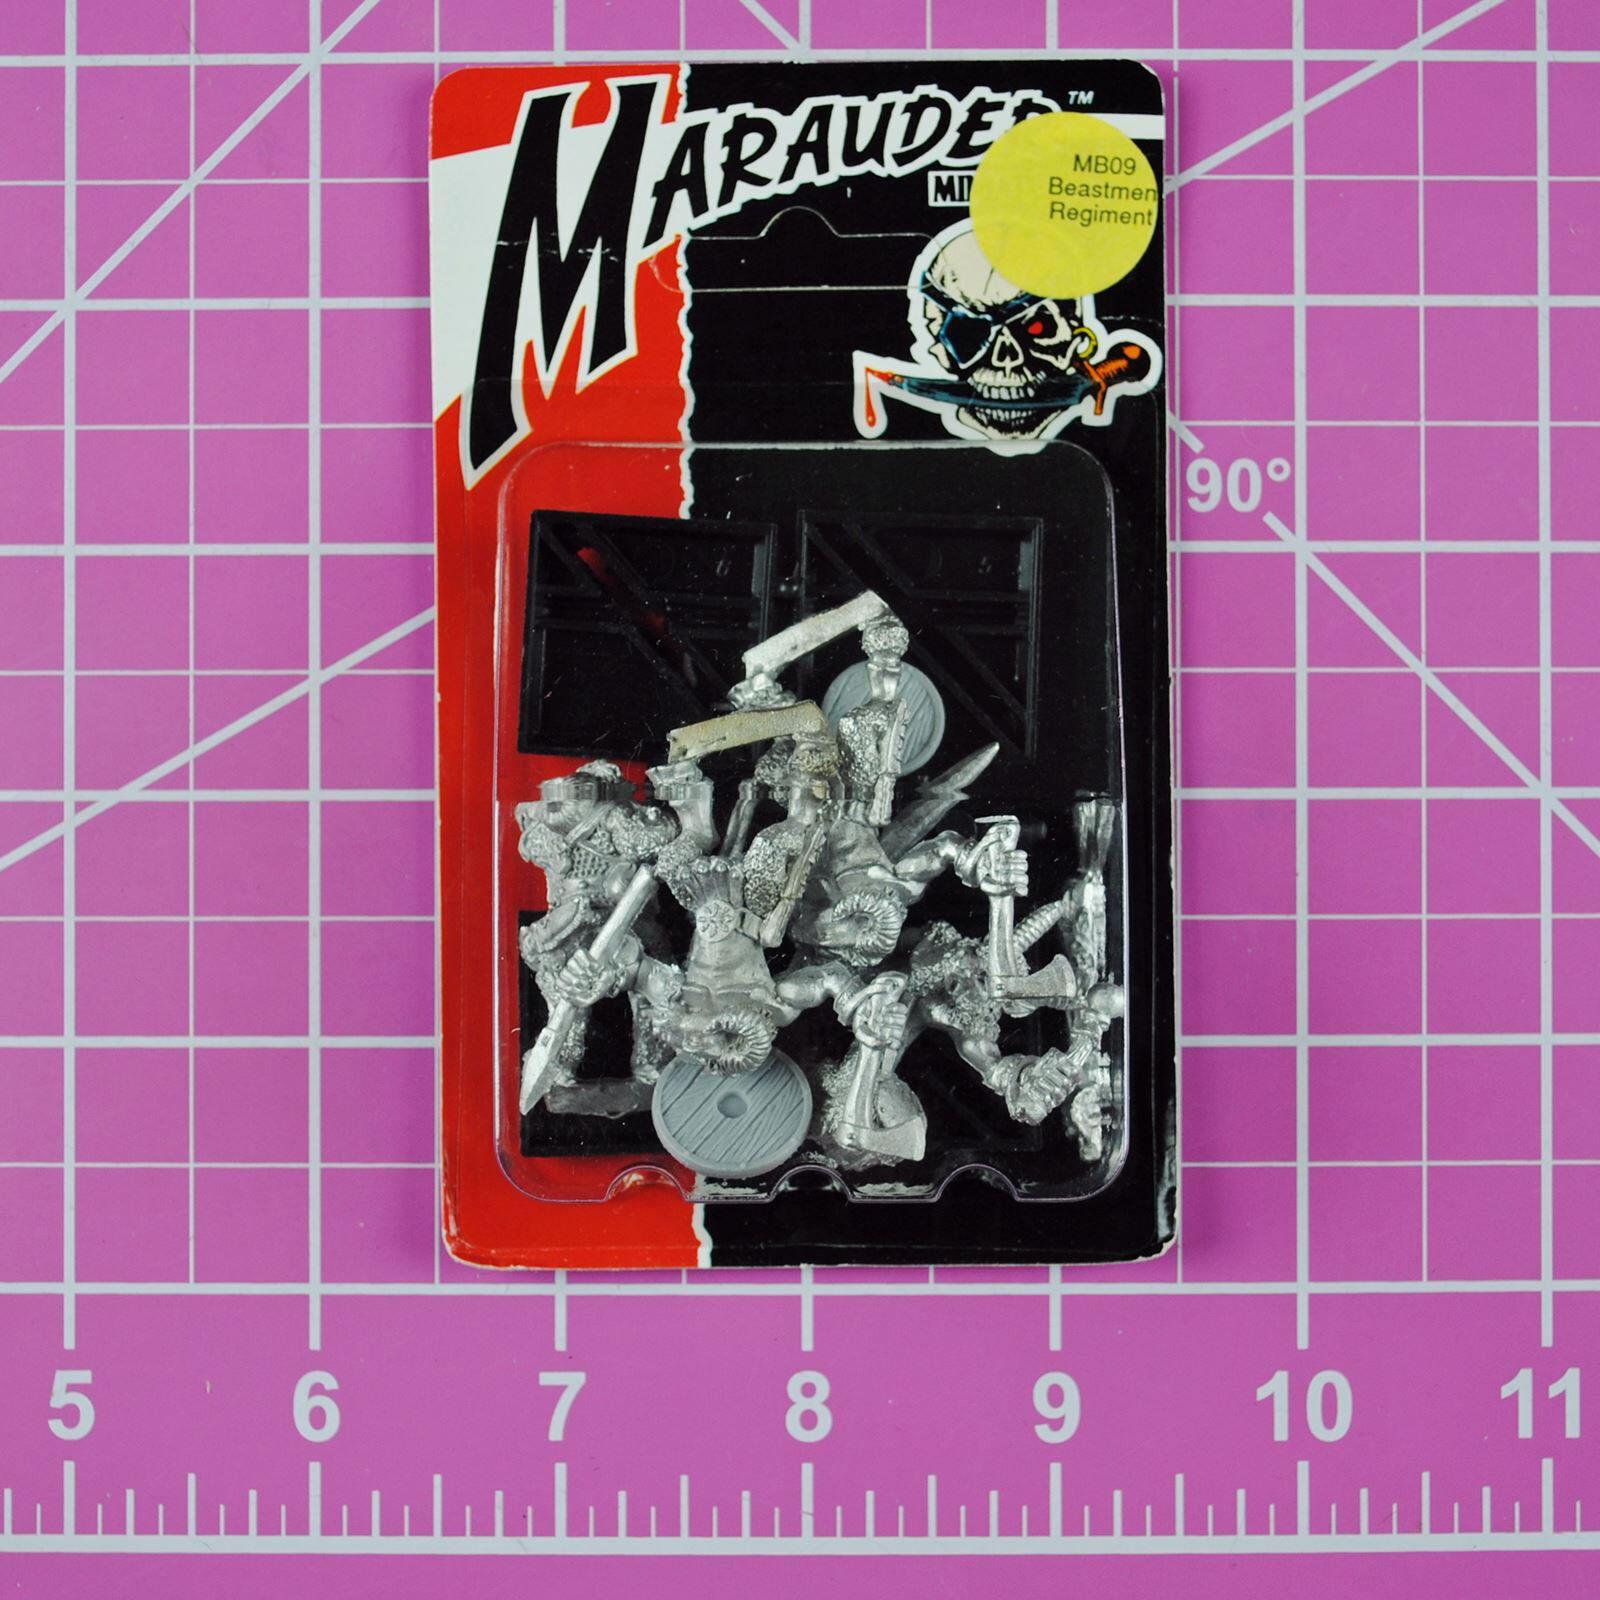 Warhammer Marauder Miniatures MM09 Beastmen Regiment NIB Metal, Rare OOP Citadel